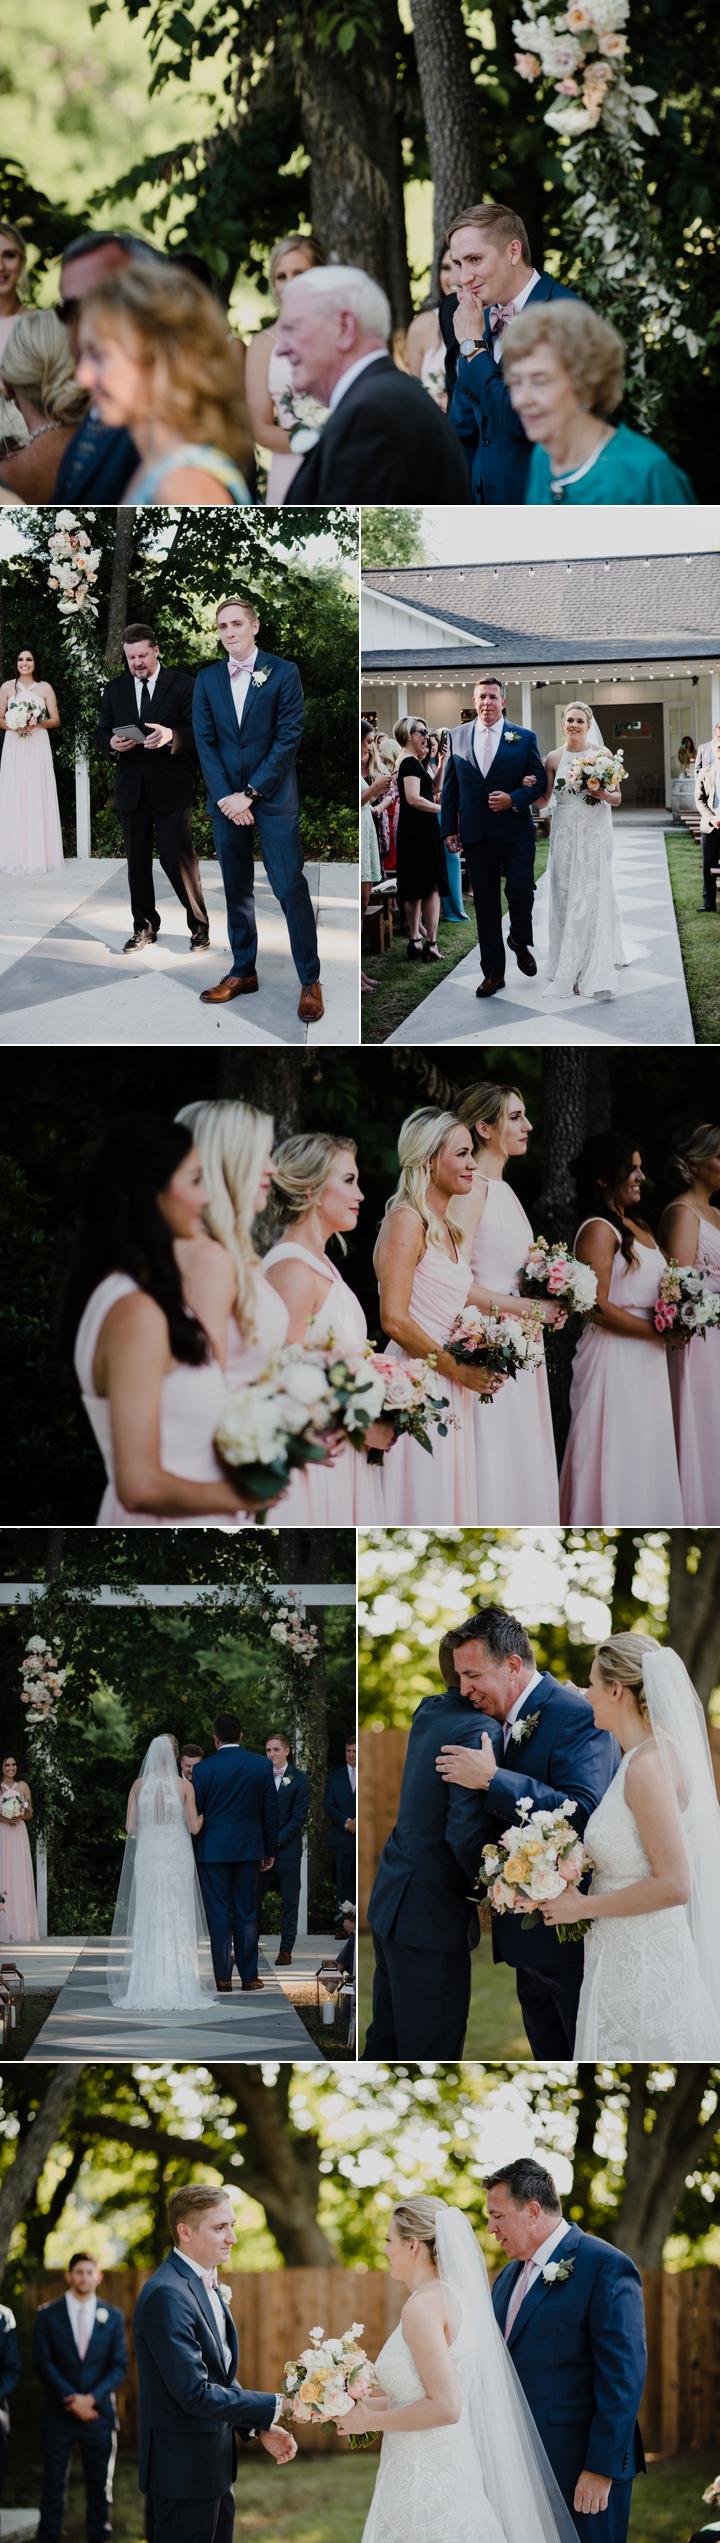 destination-wedding-photographers 12.jpg